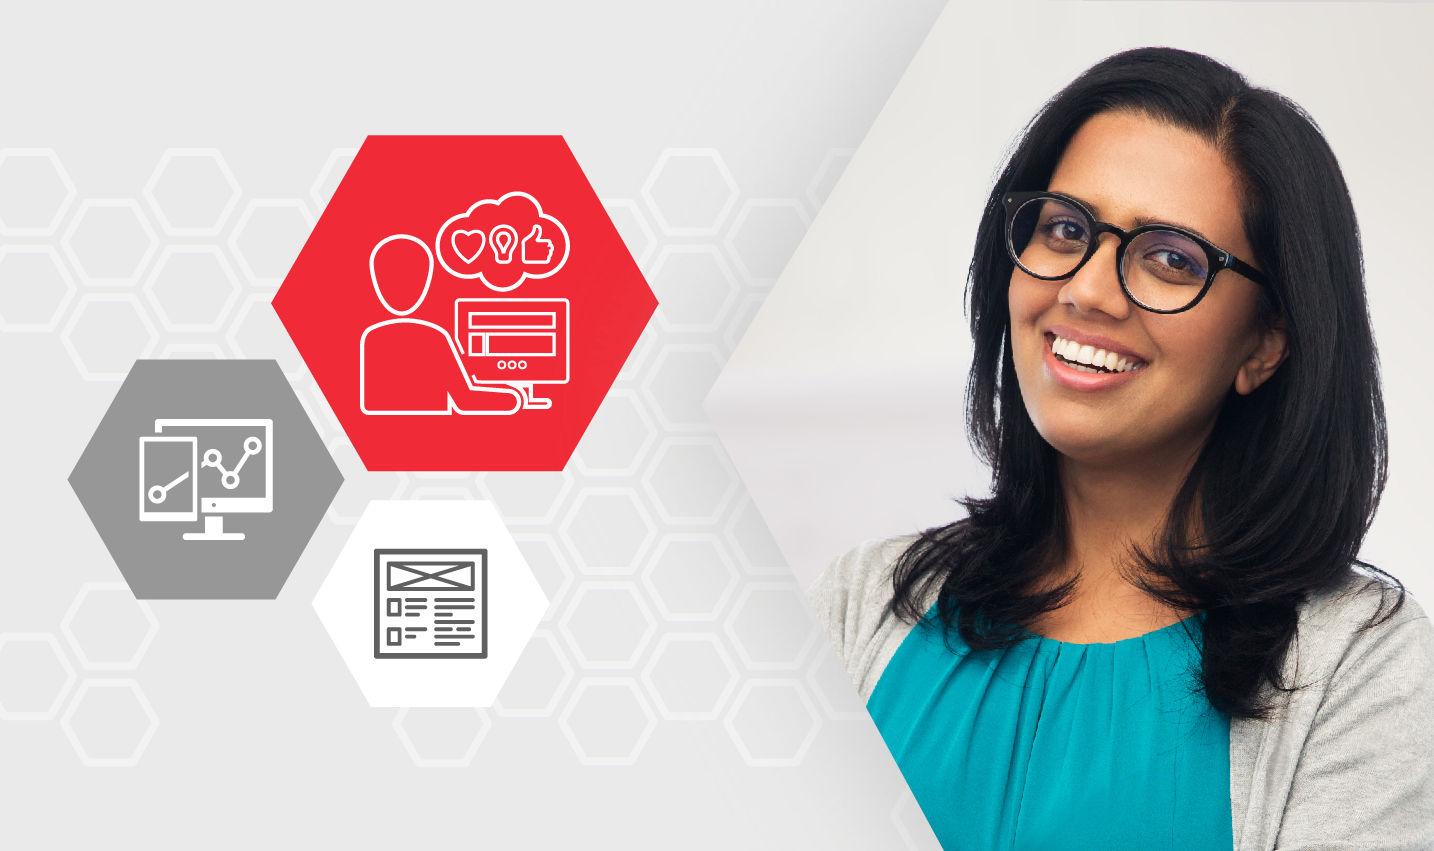 UpGrad Digital Marketing Program Review- Product Management Certificate Program